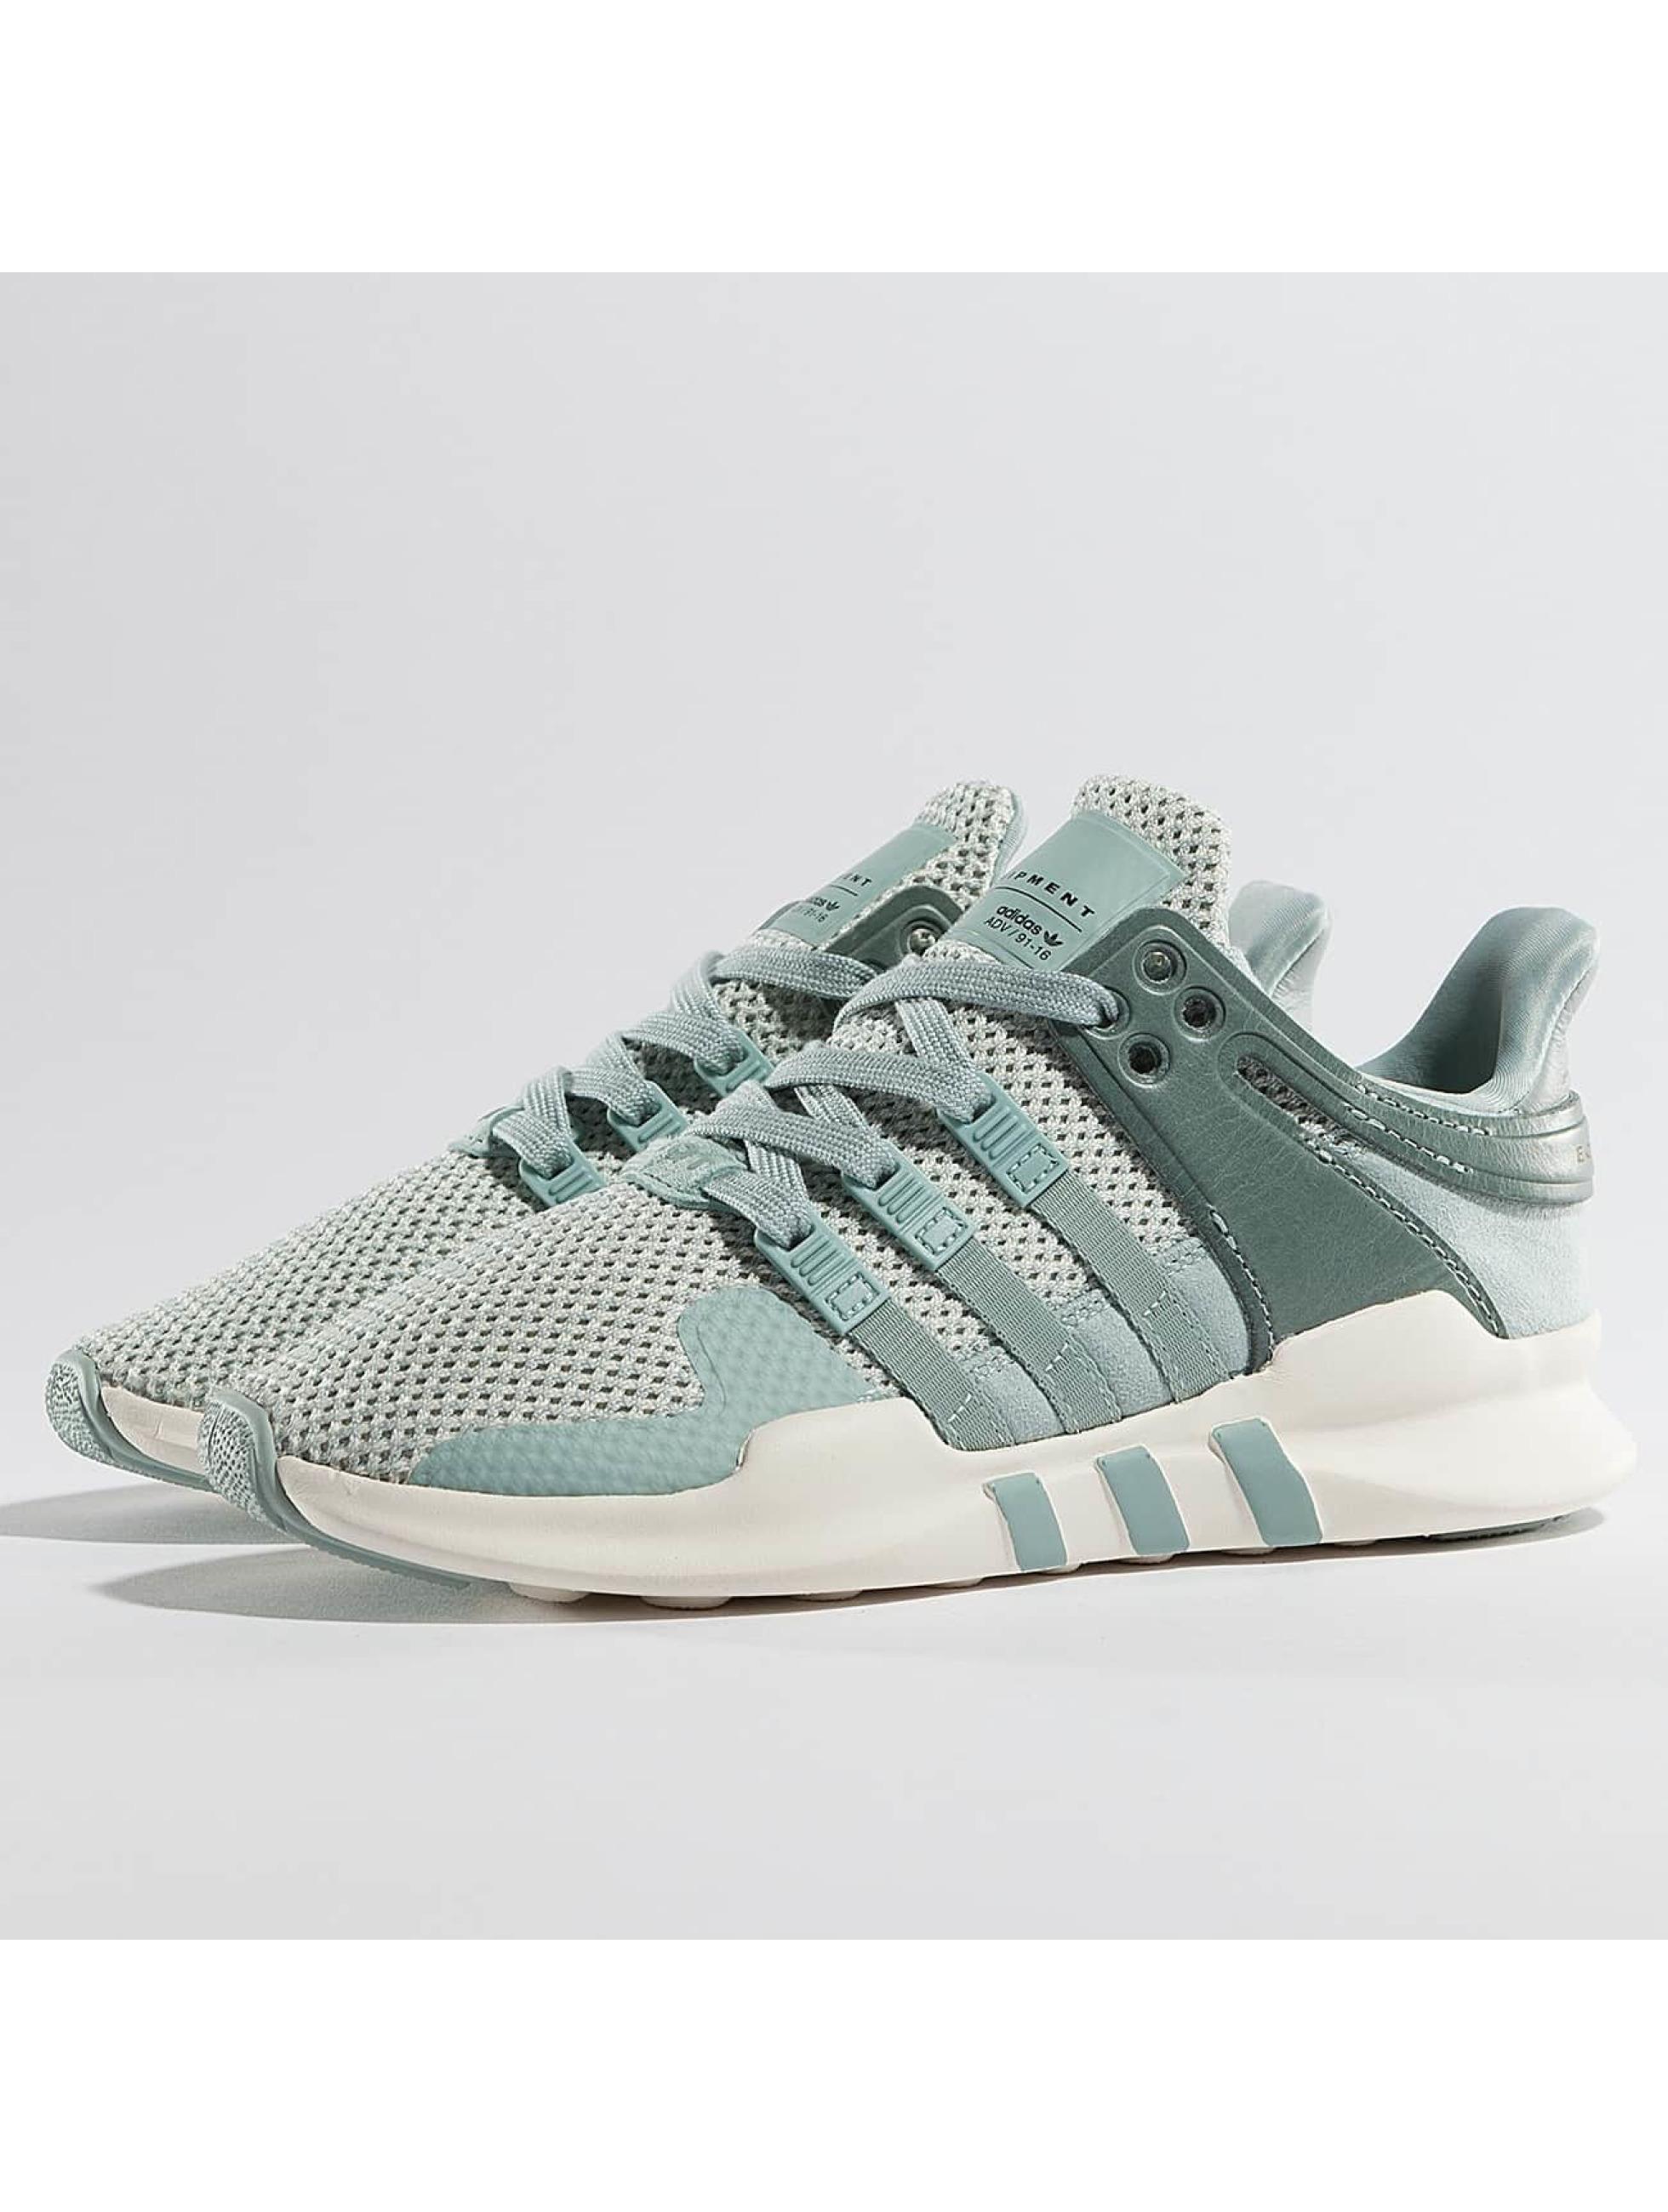 ... adidas damen sneaker eqt support adv in grün 304172